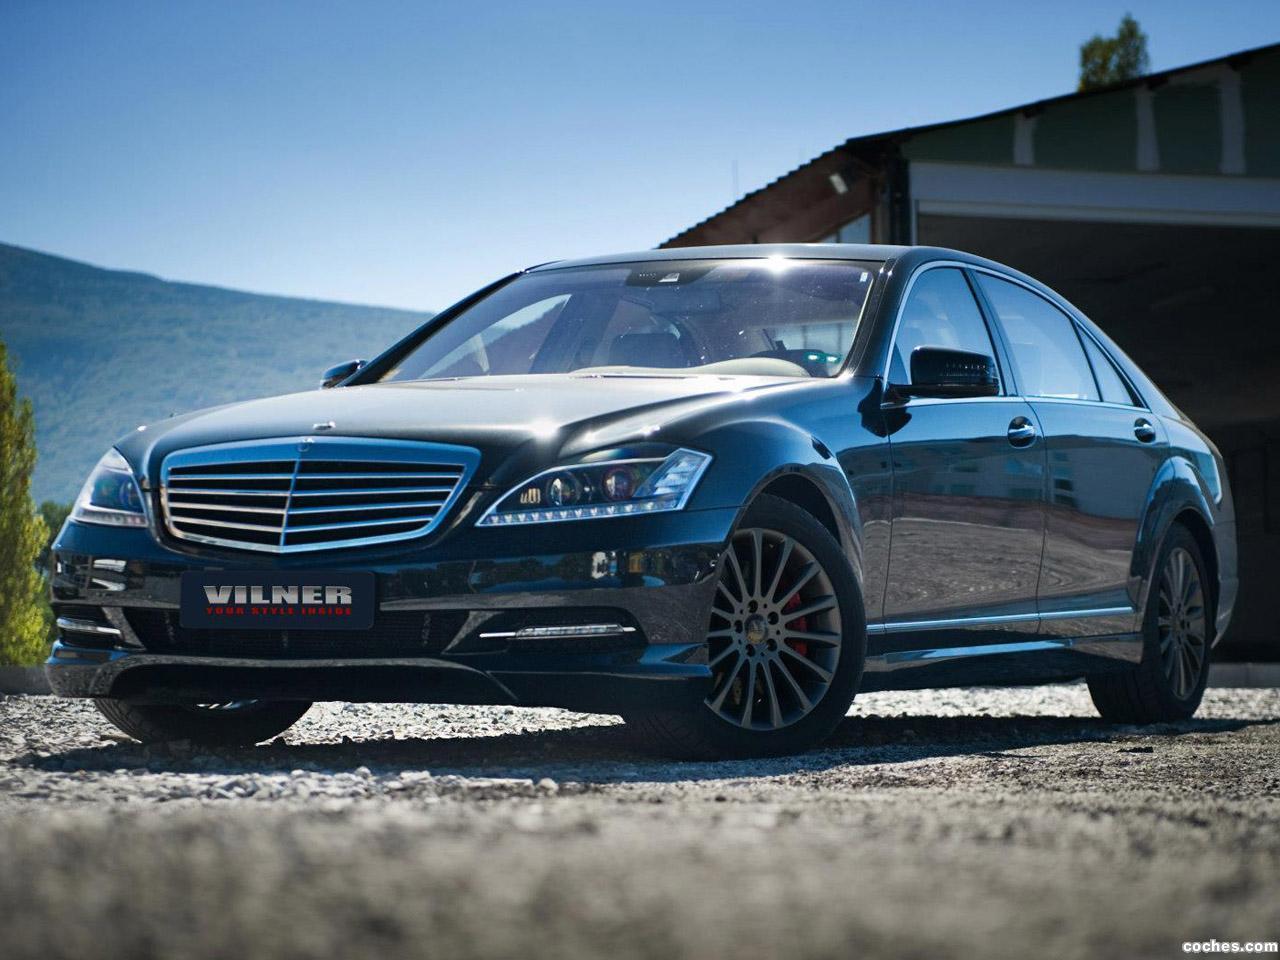 Foto 0 de Mercedes Vilner Carlsson Clase S S500 2012